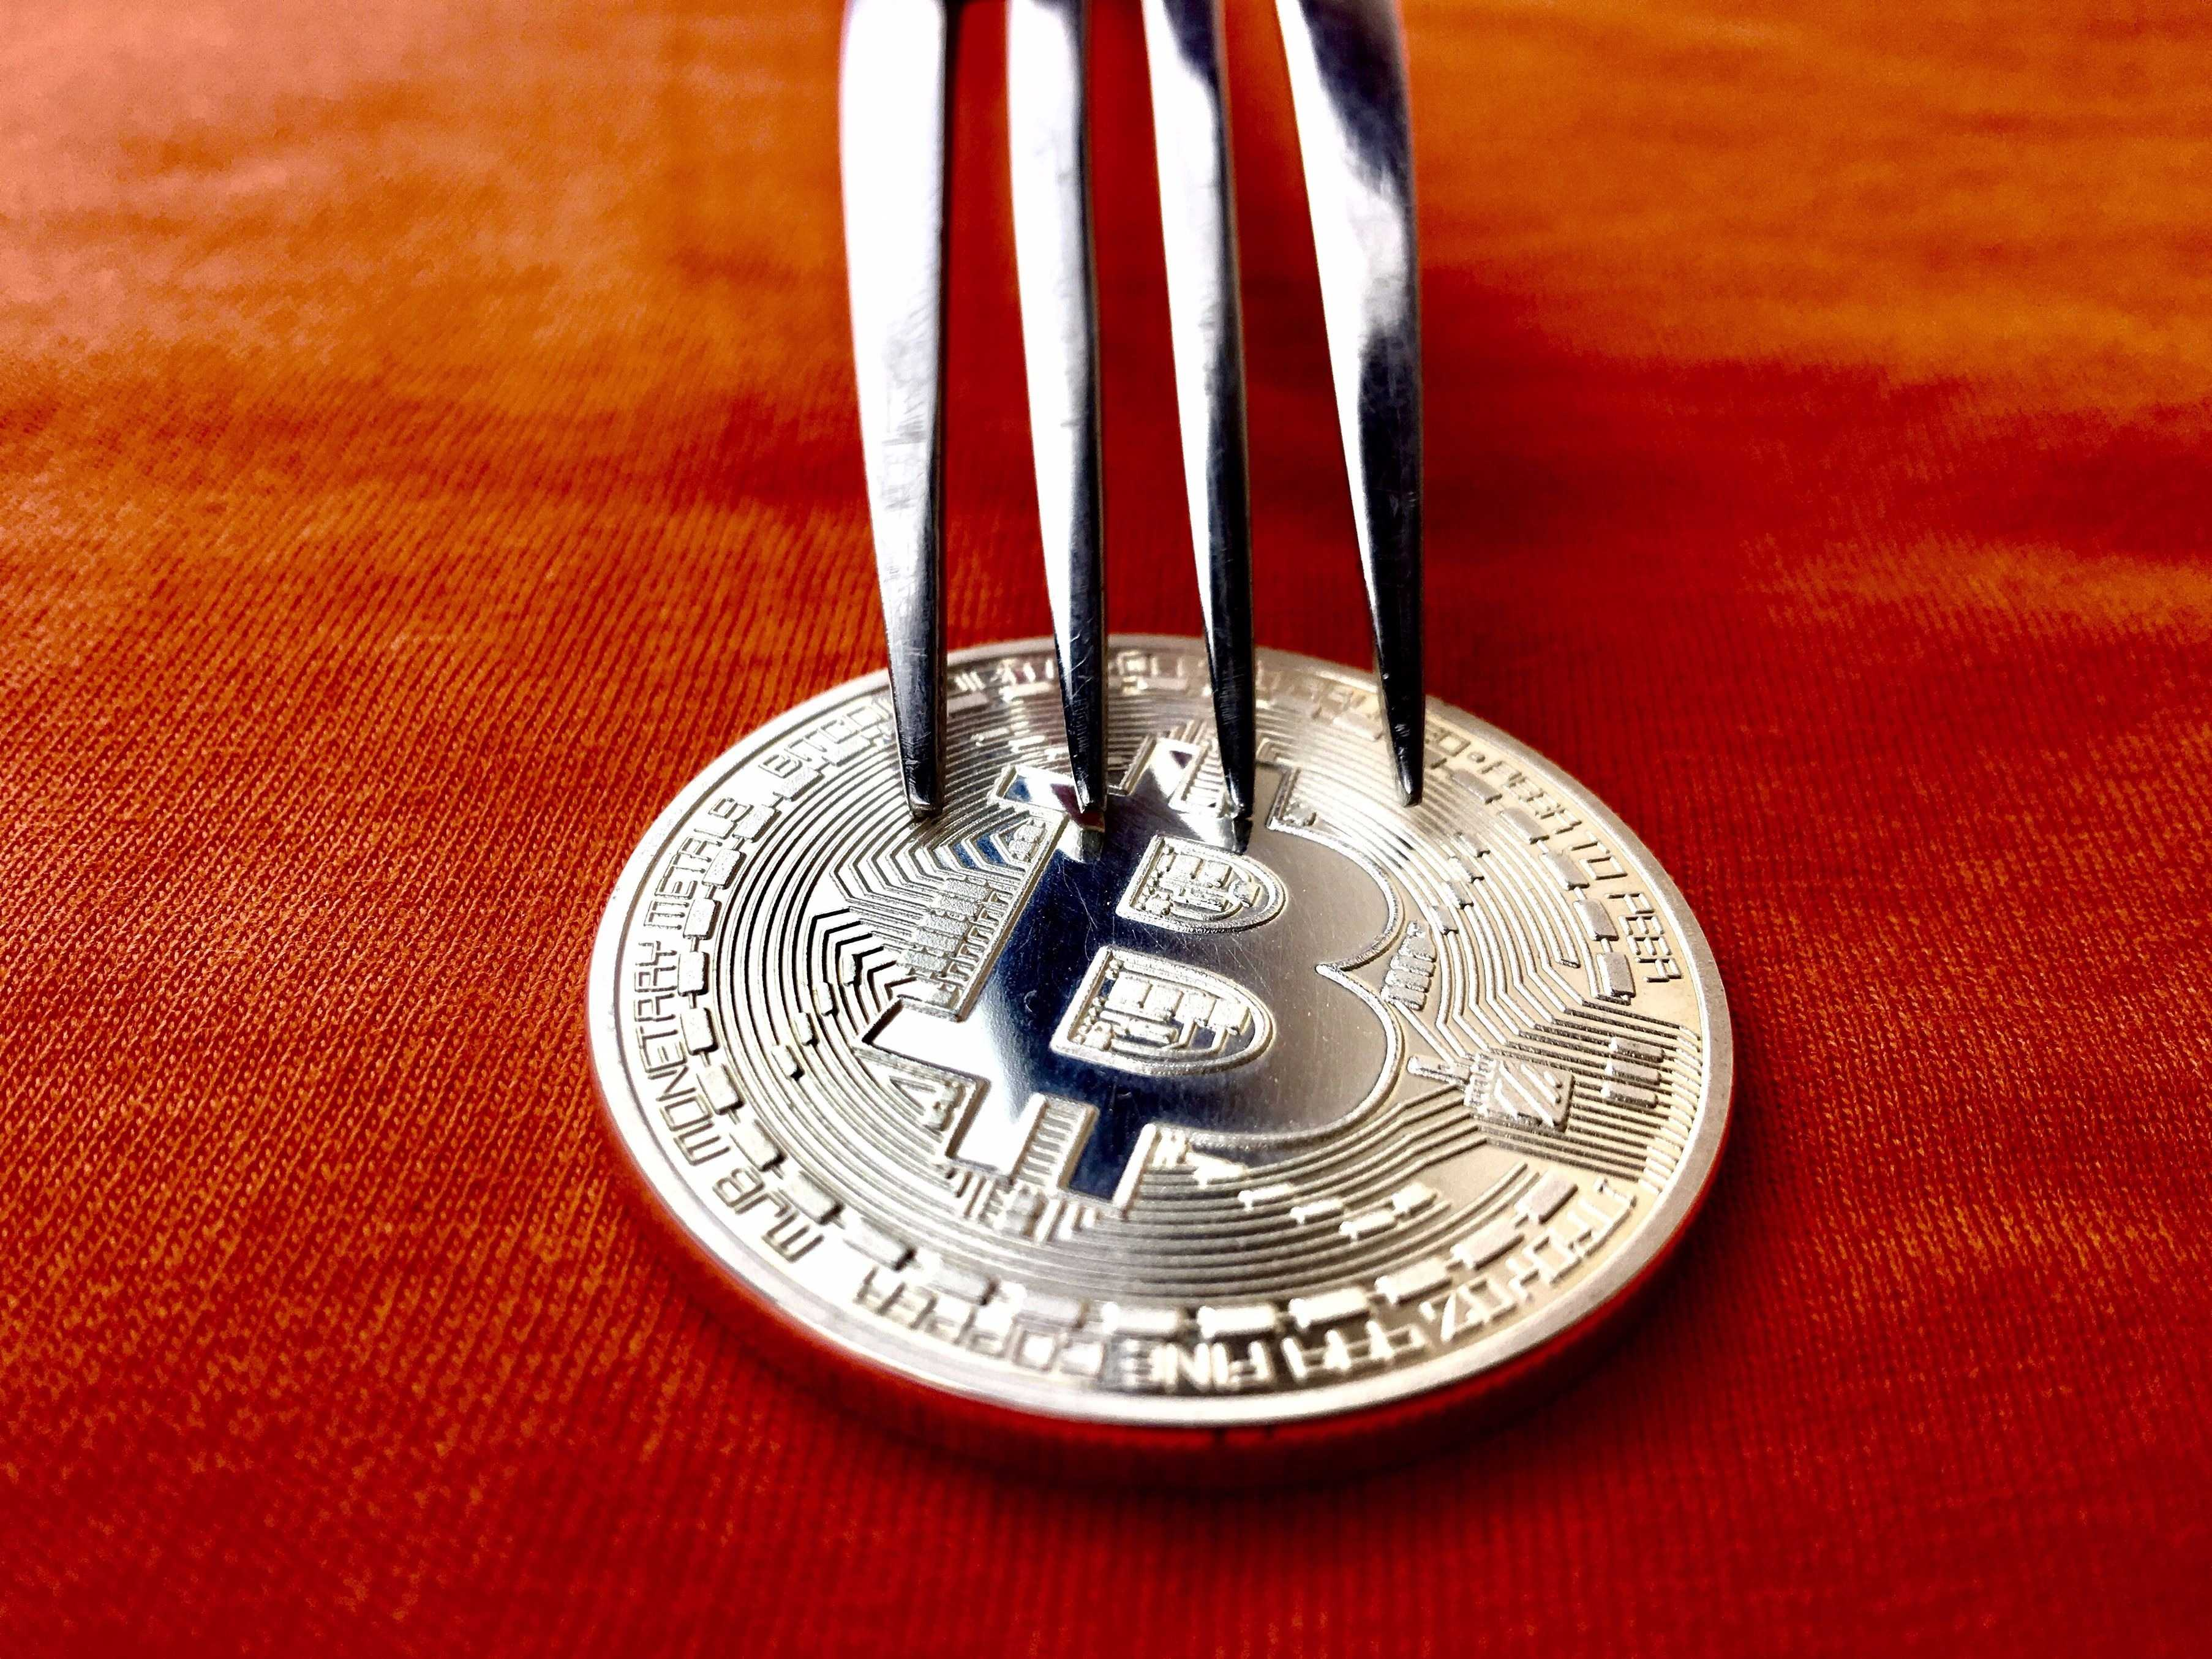 Хардфорка Bitcoin не будет!